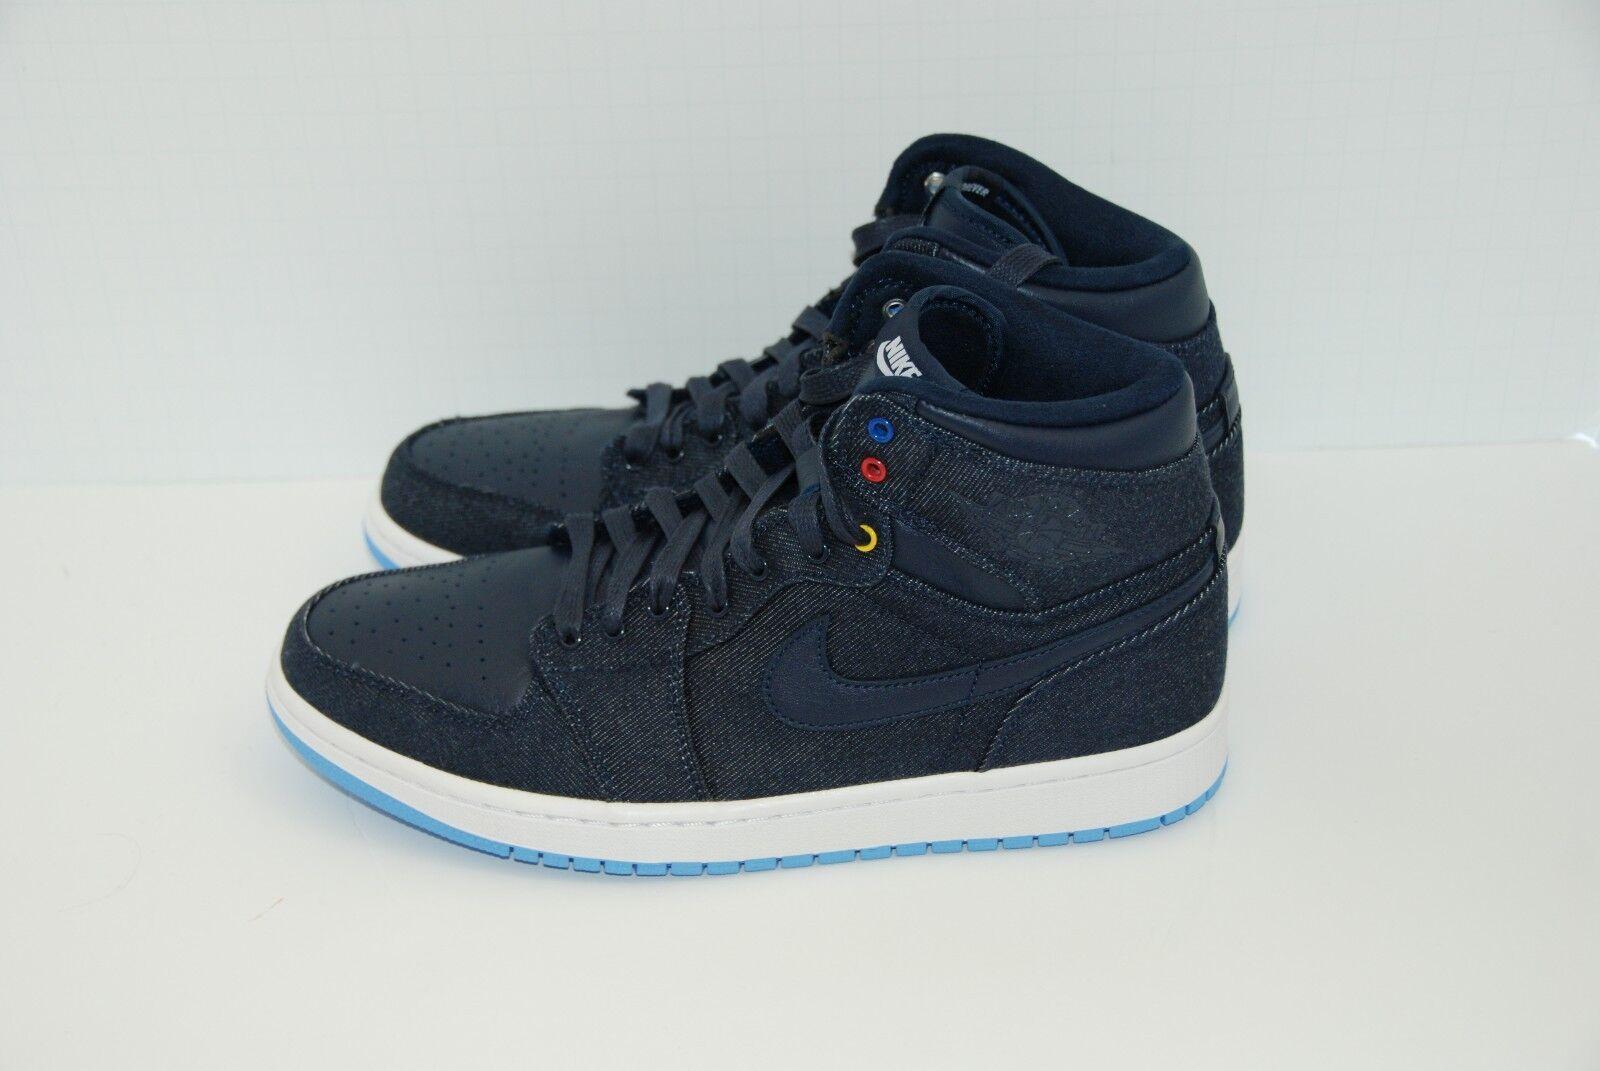 Nike air jordan 8,5 1 retro - hohe og familie ewig vatertag 8,5 jordan uns 03f92d